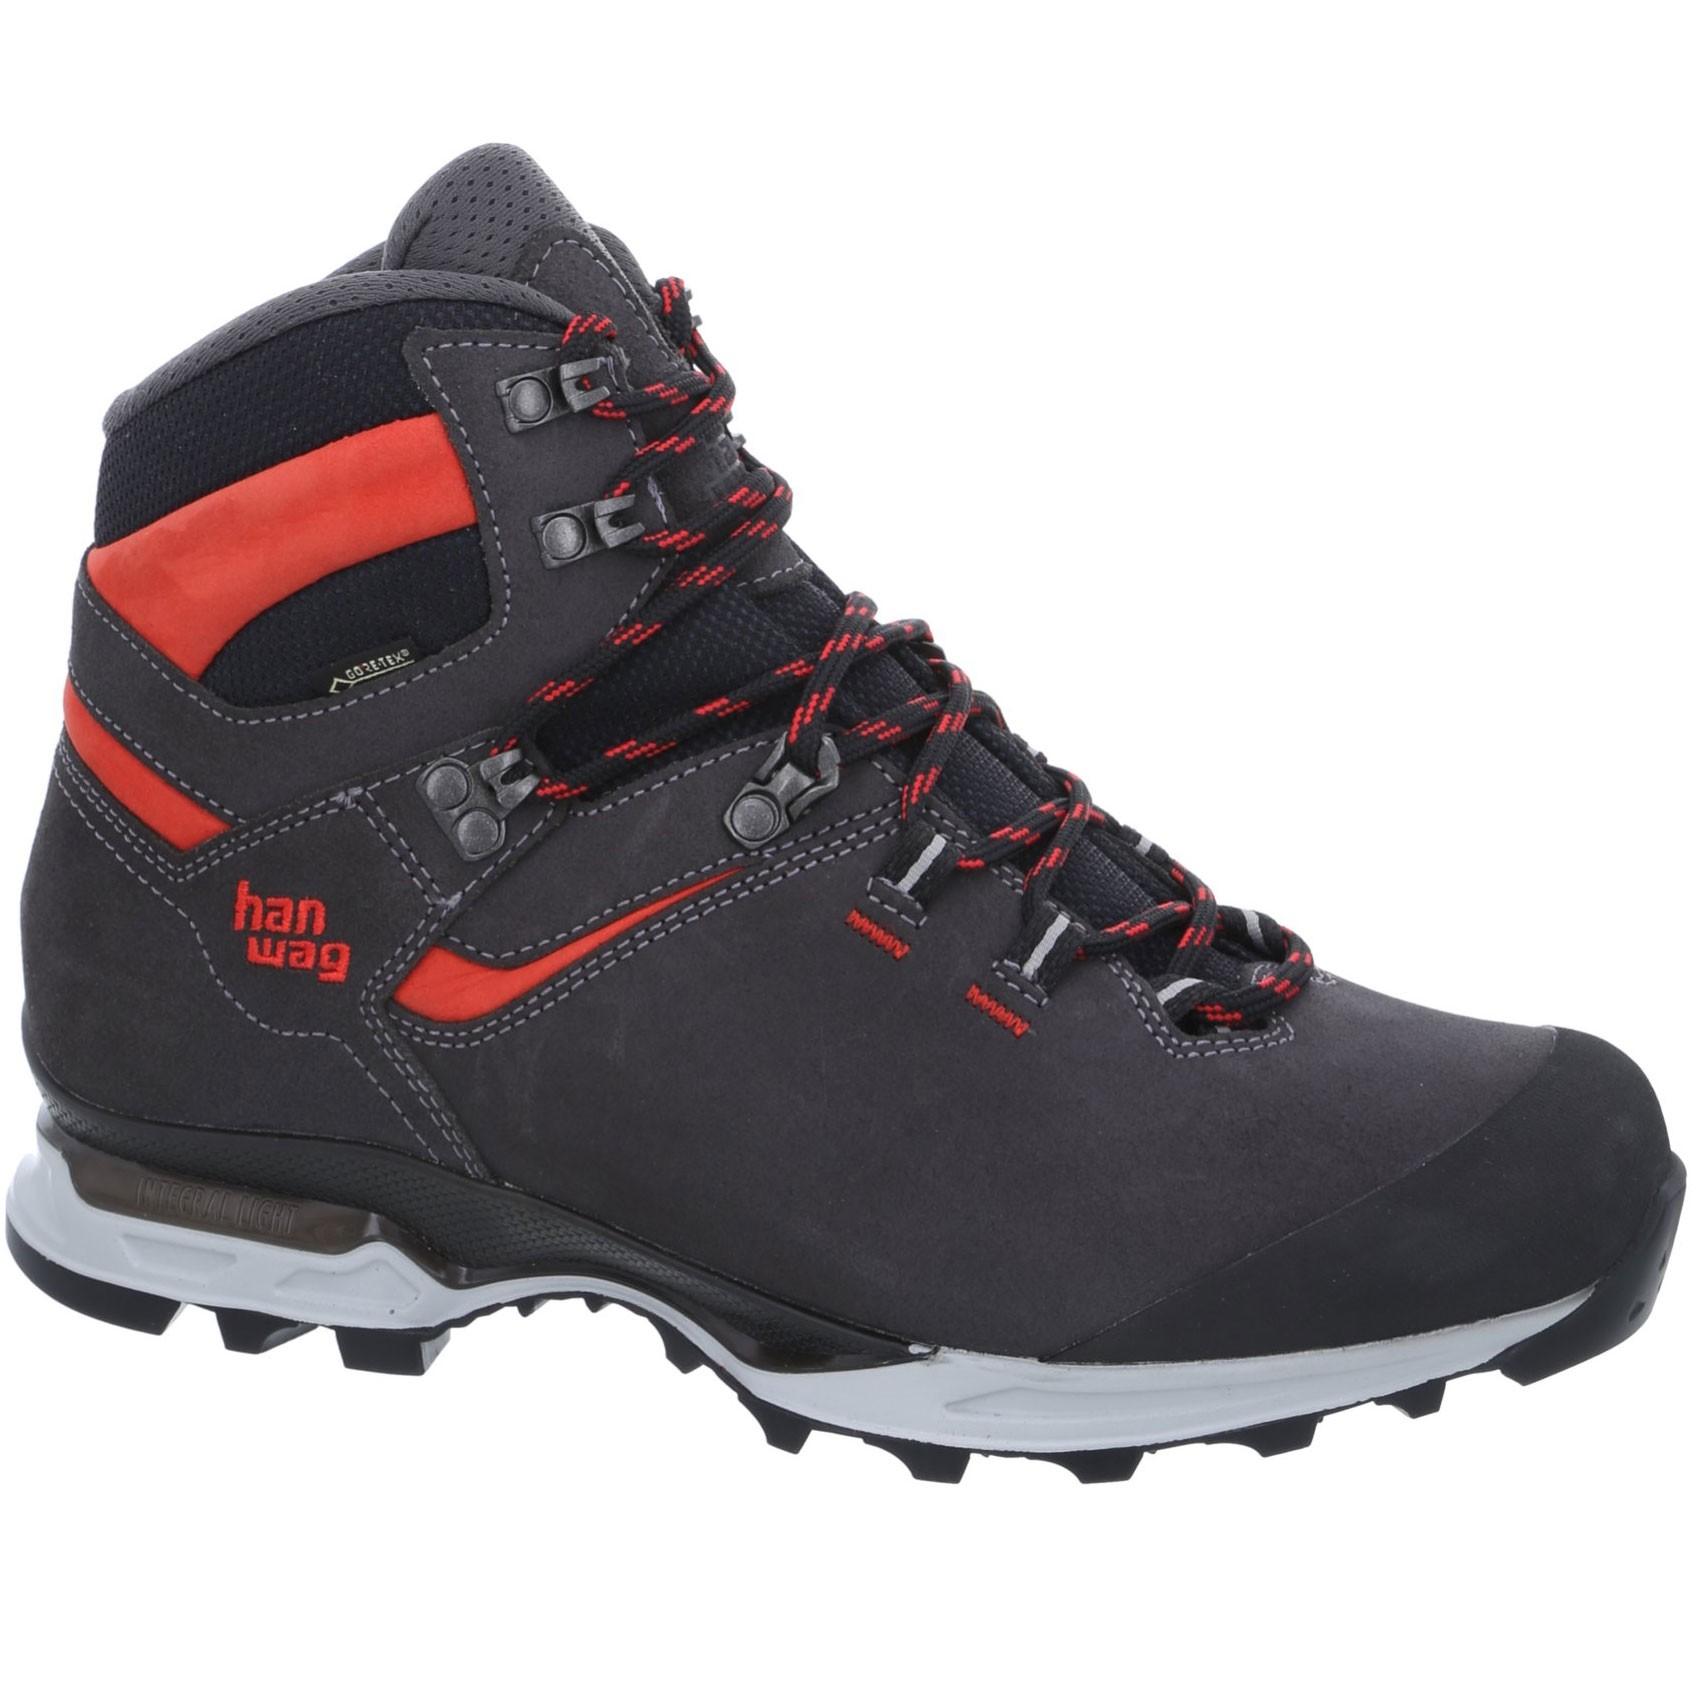 Hanwag Tatra Light GTX Walking Boots - Asphalt/Red